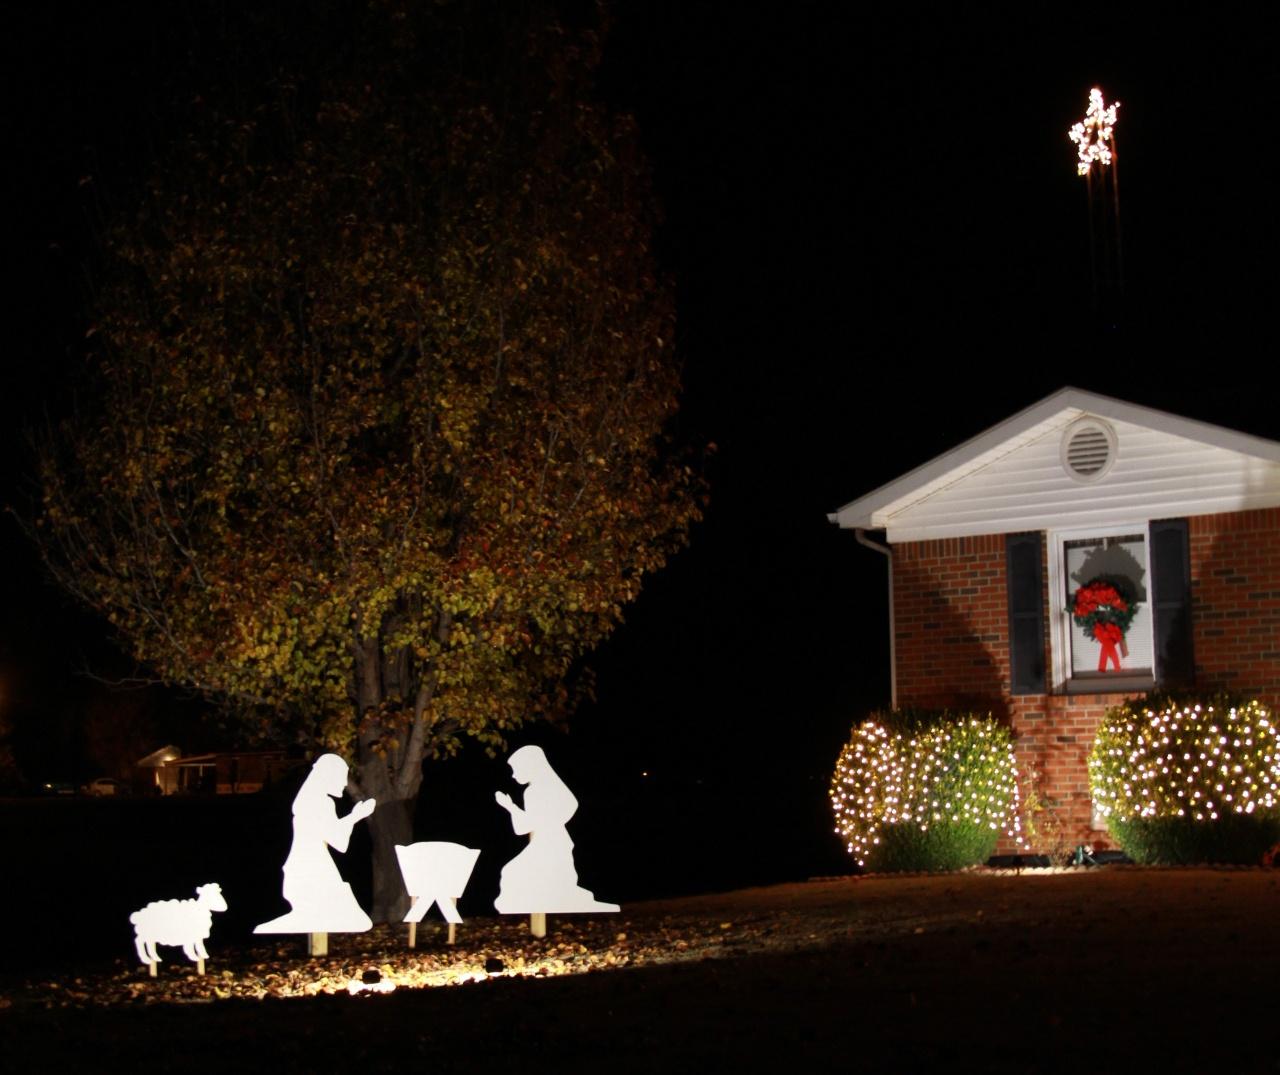 Nativity Scene DIY + Cook Portable Warehouses